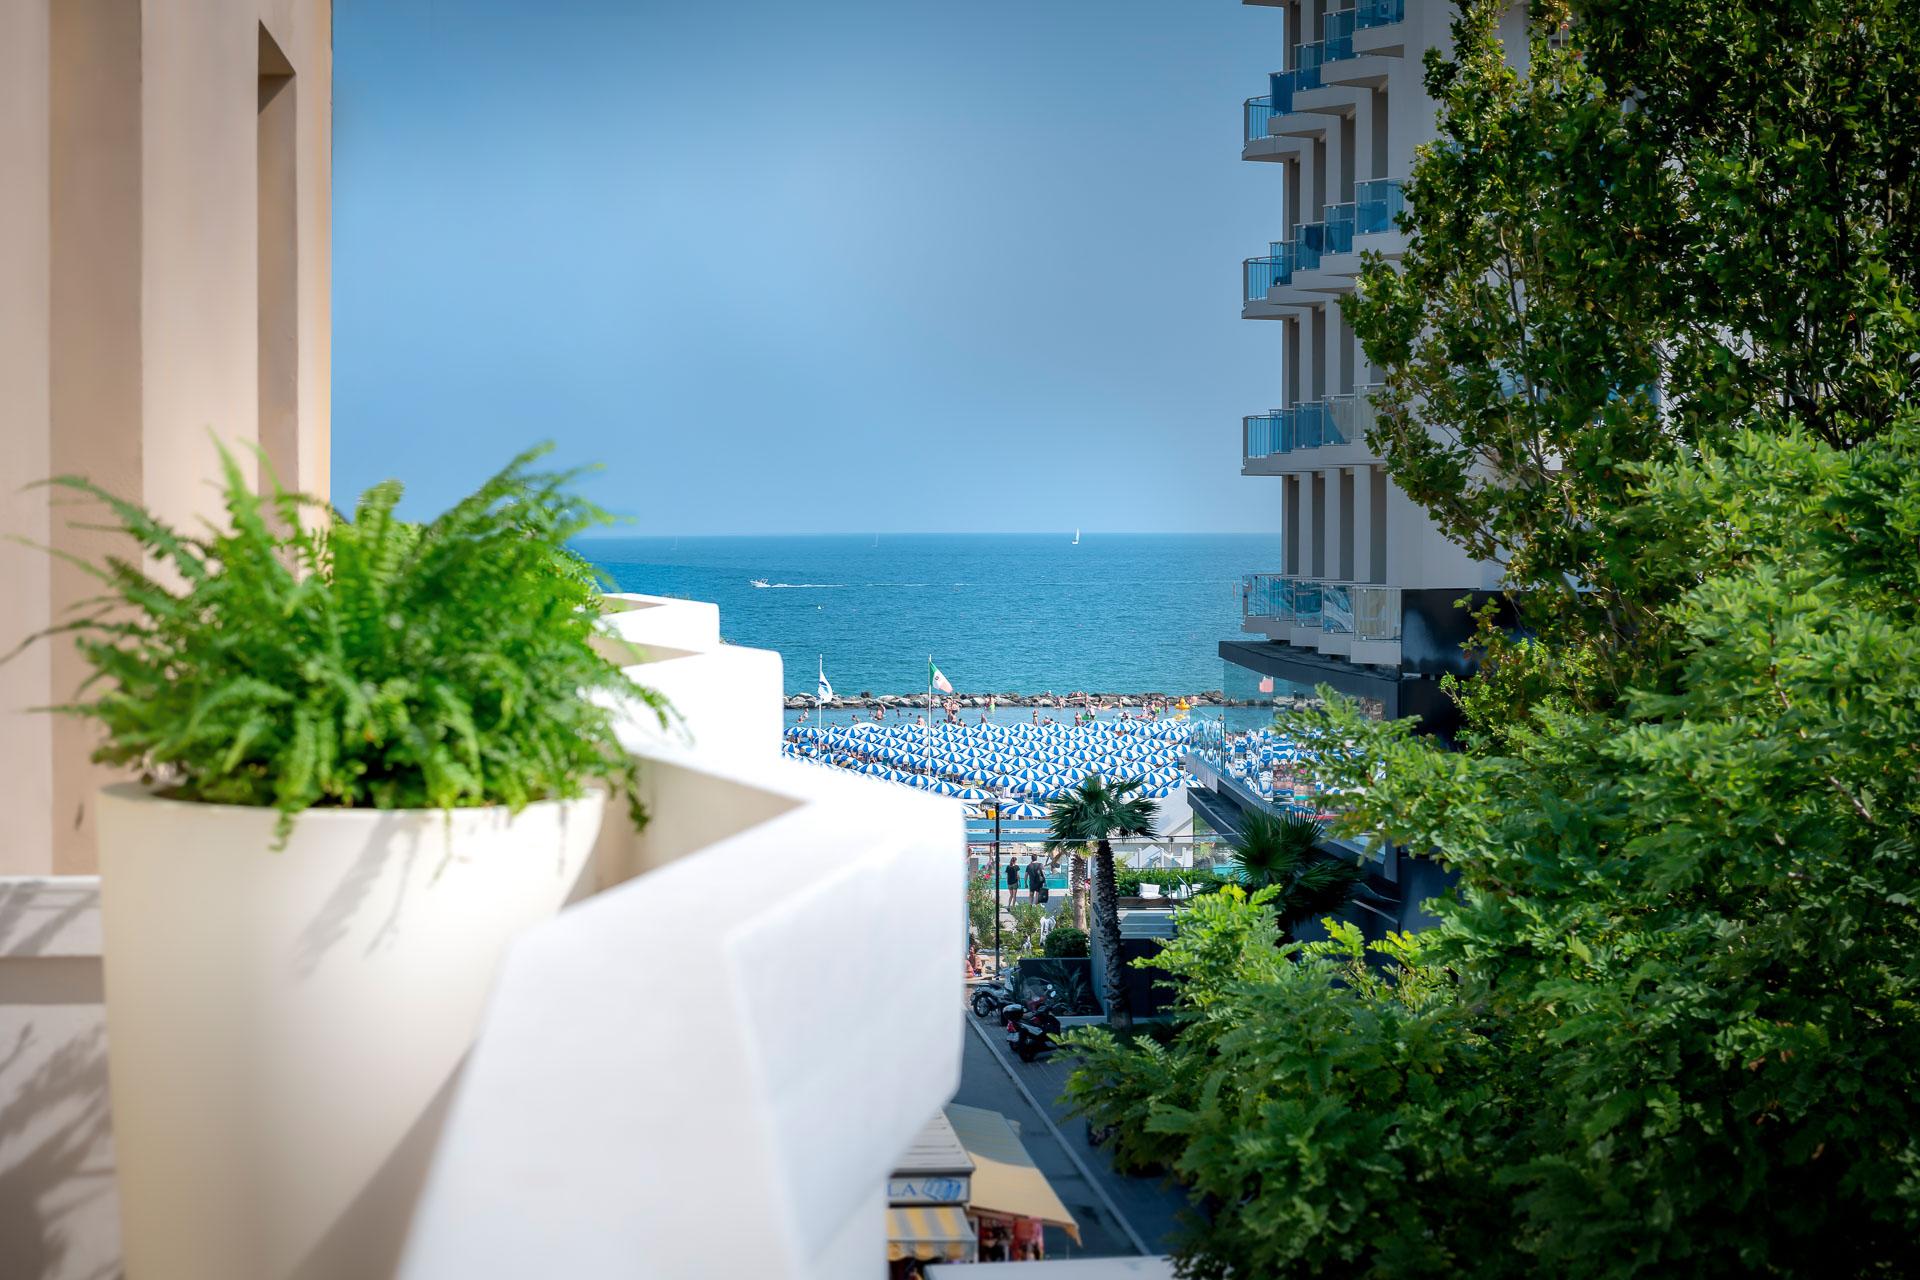 Hotel-Cristina-Corona-Terrazza-2.jpg